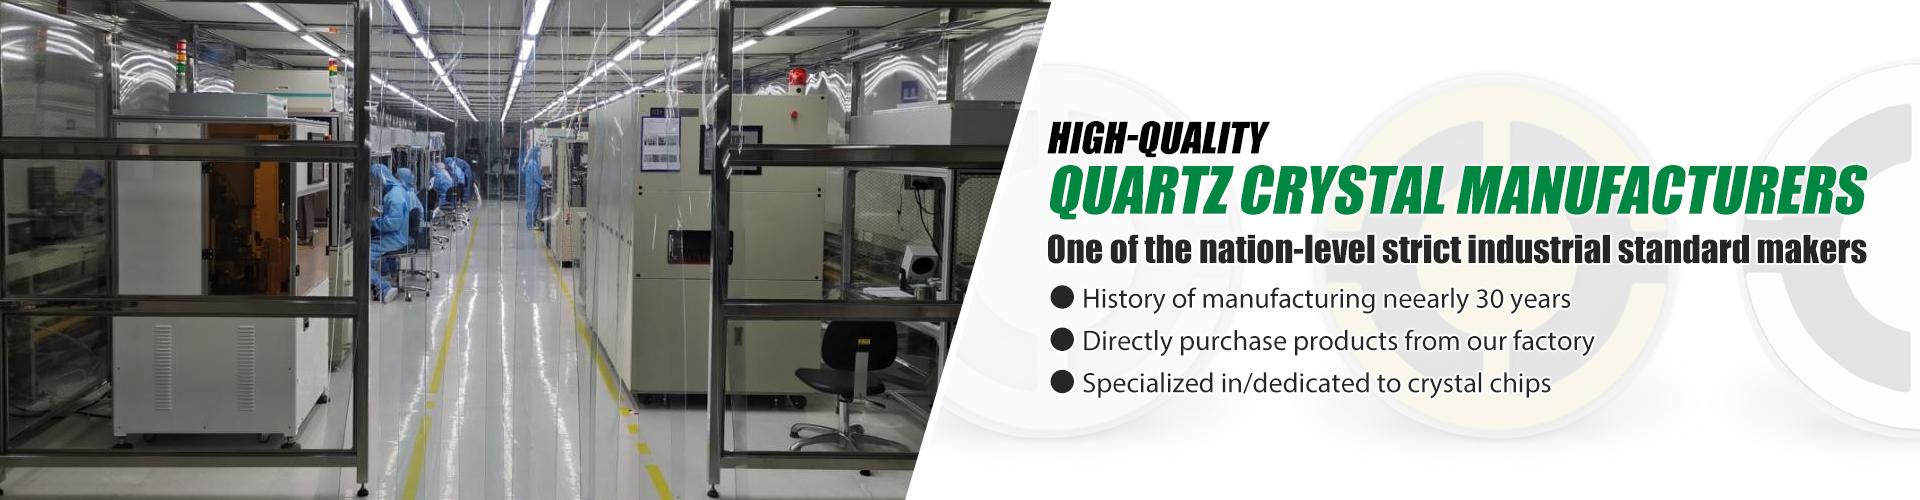 high-quality quartz crystal manufacturers Banner 1029